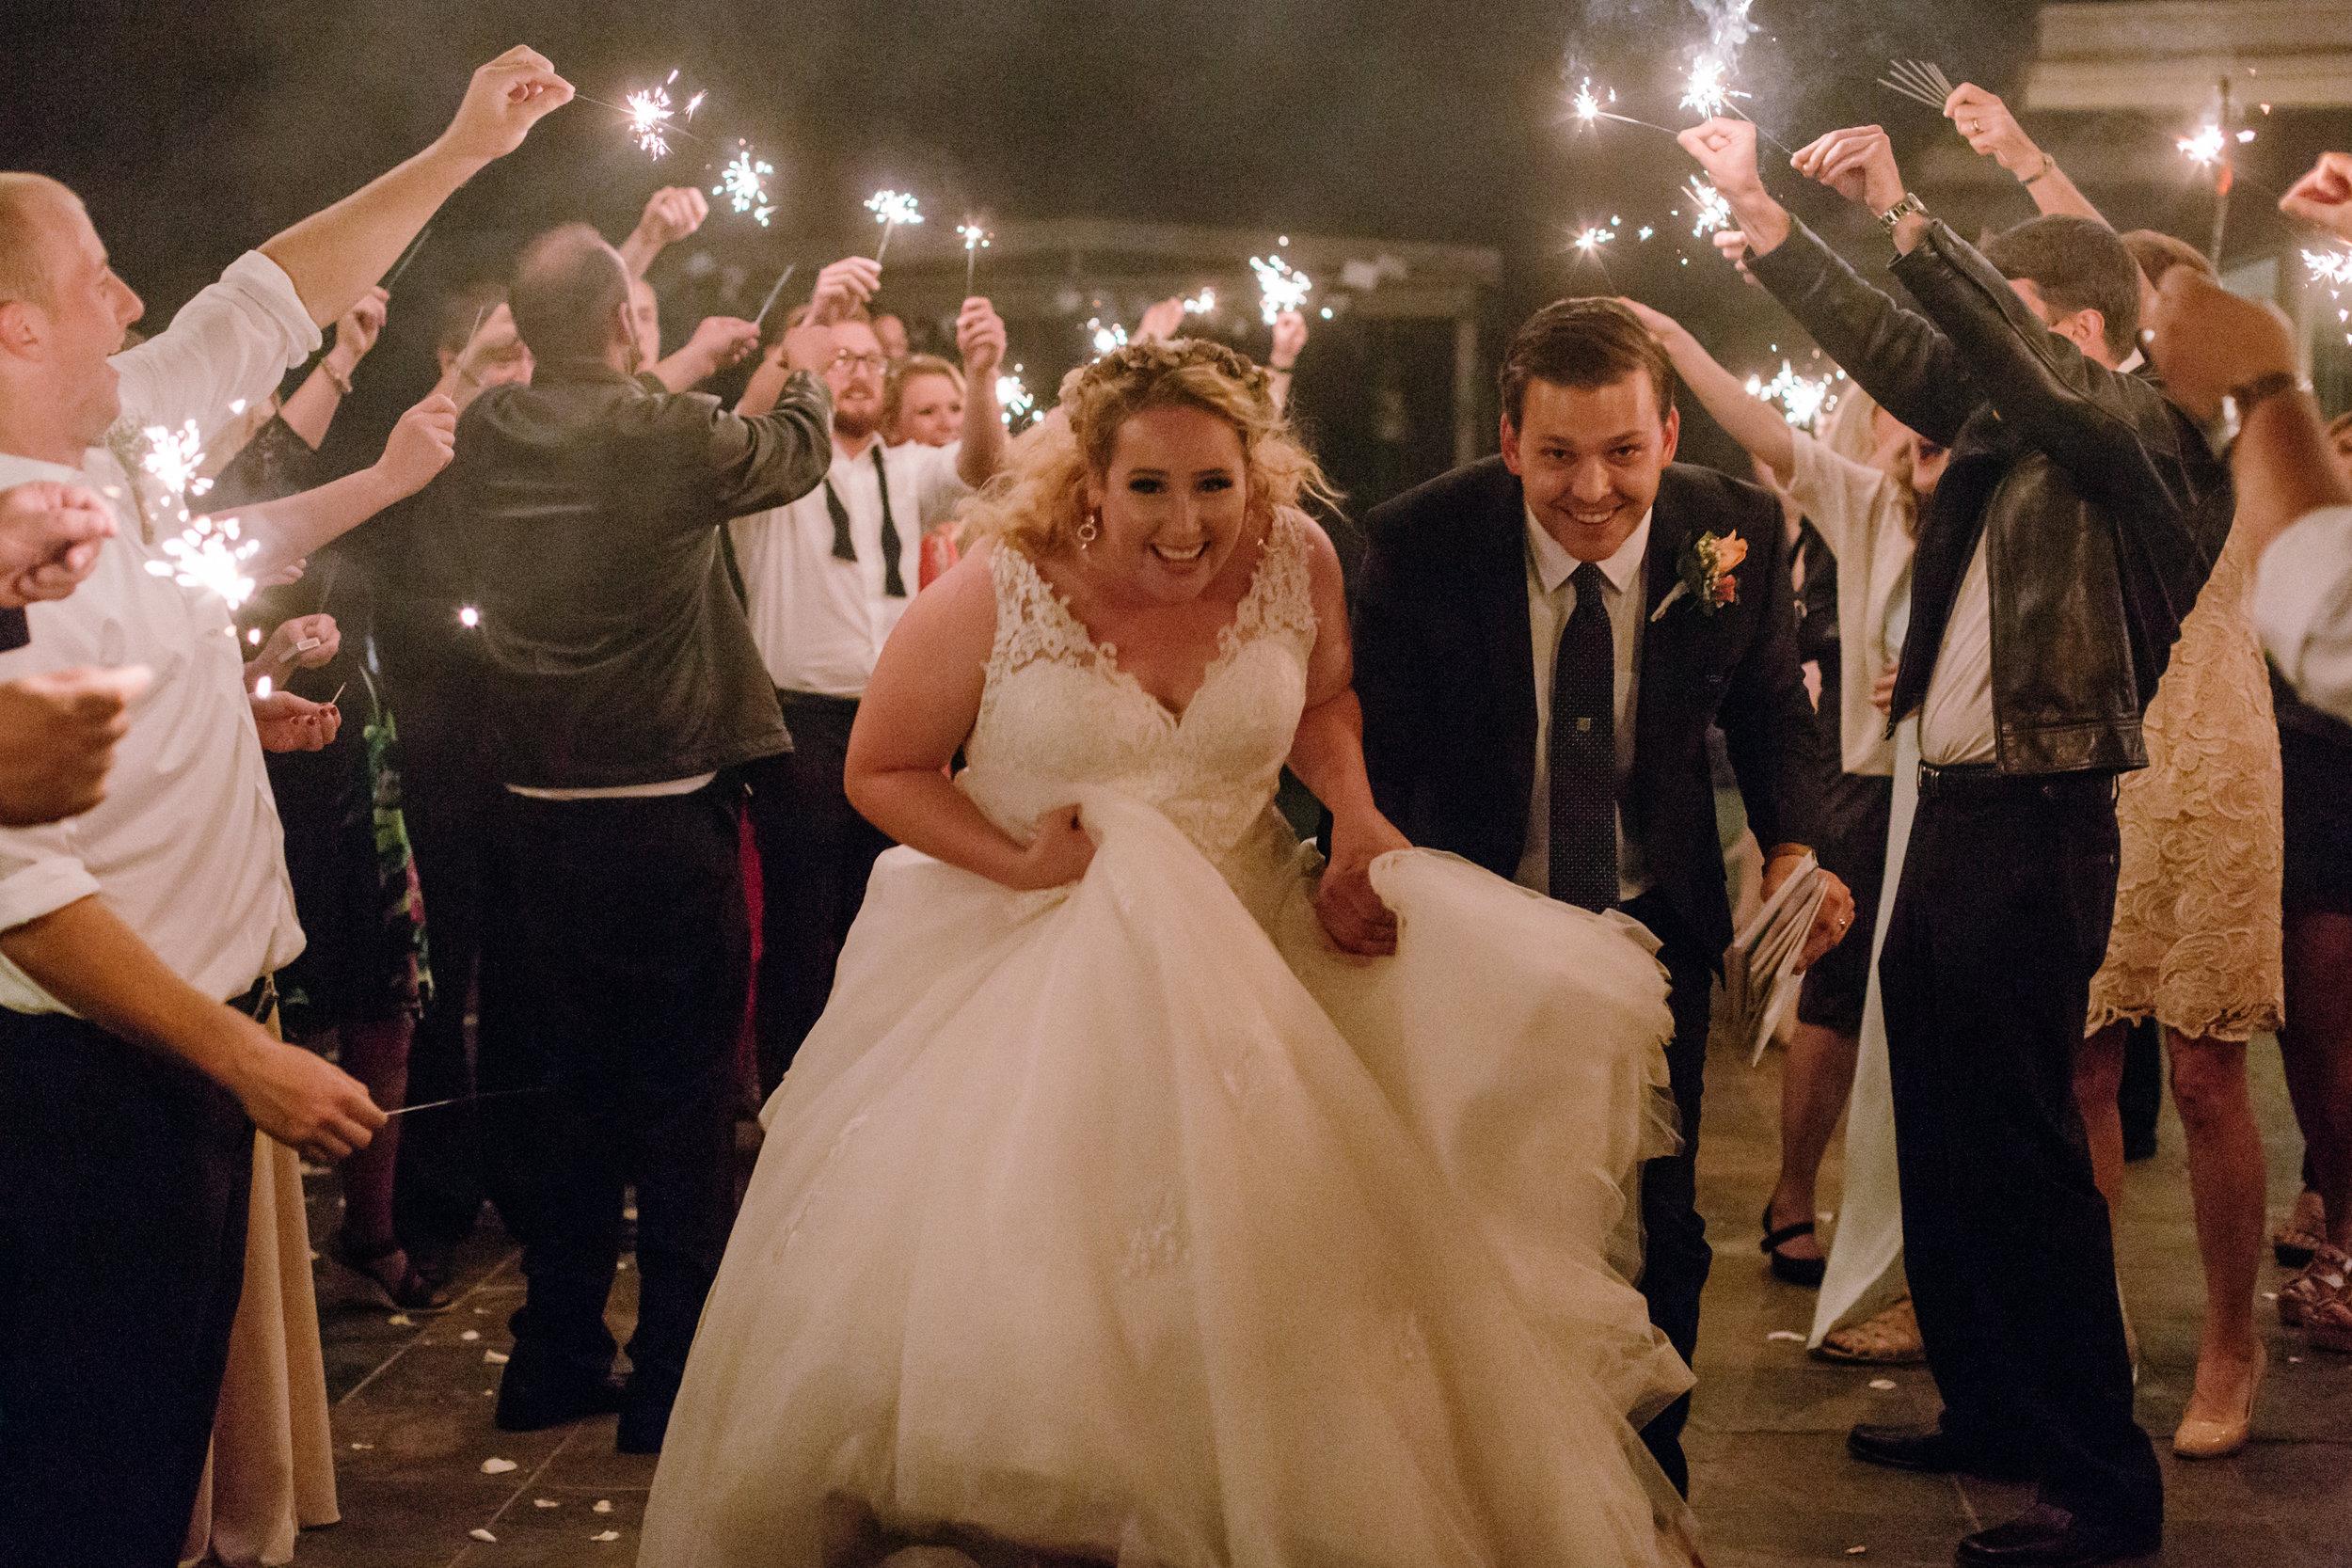 KaraNixonWeddings-PalosVerdes-Wedding-78.jpg